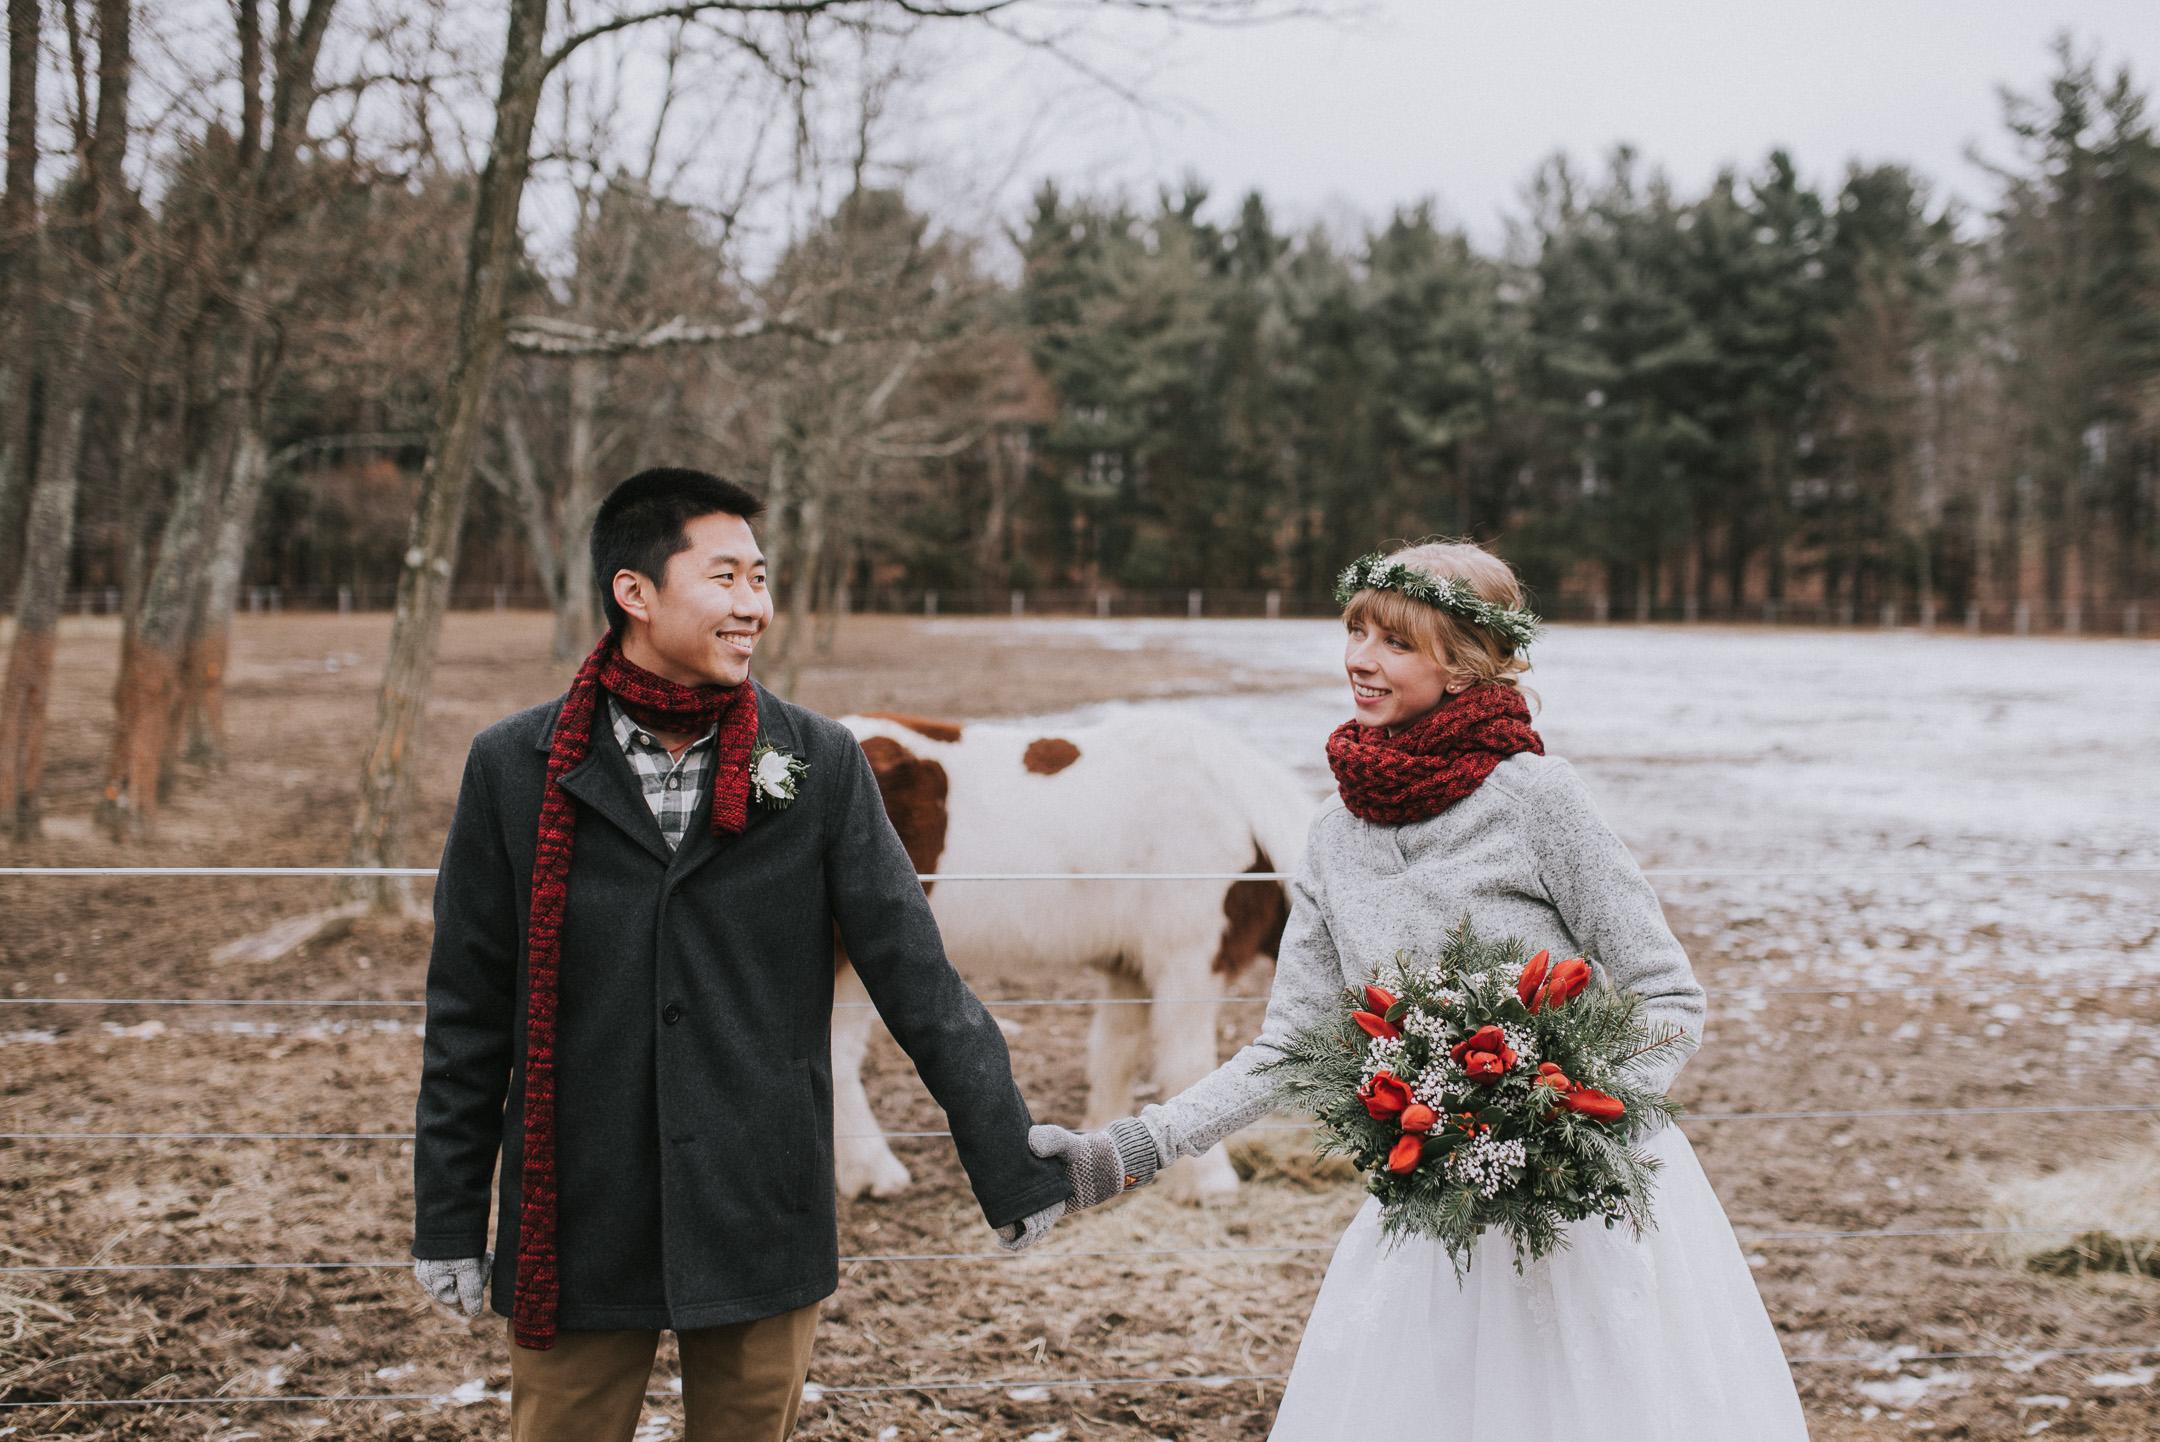 thurmont wedding photographer (7 of 9).jpg